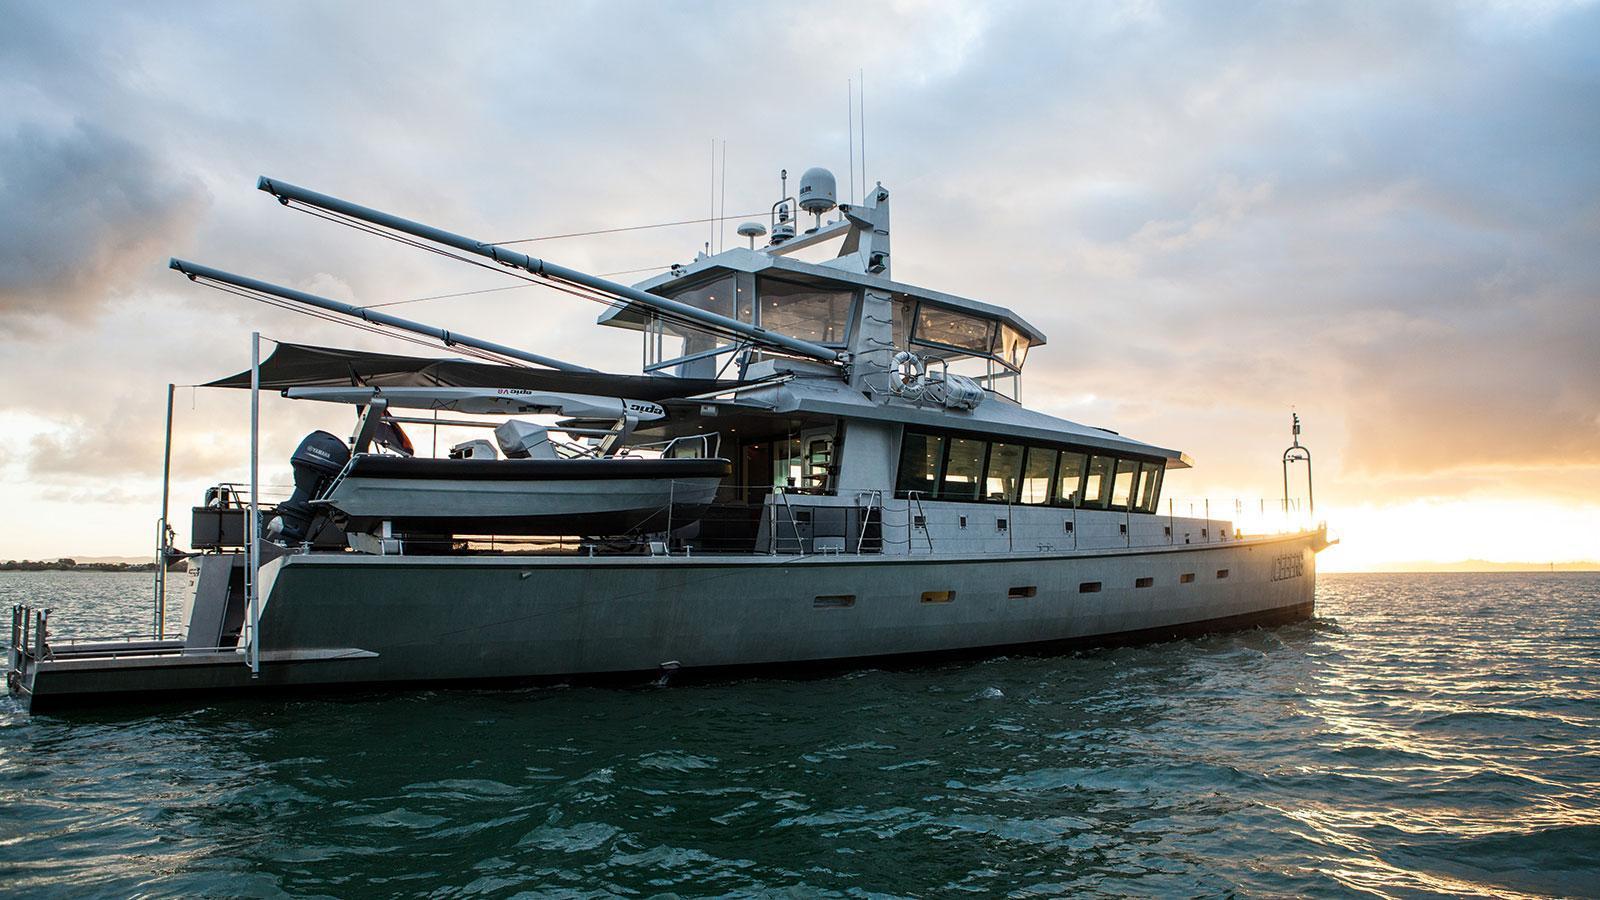 iceberg-motor-yacht-circa-marine-fpb-97-2015-34m-profile-stern